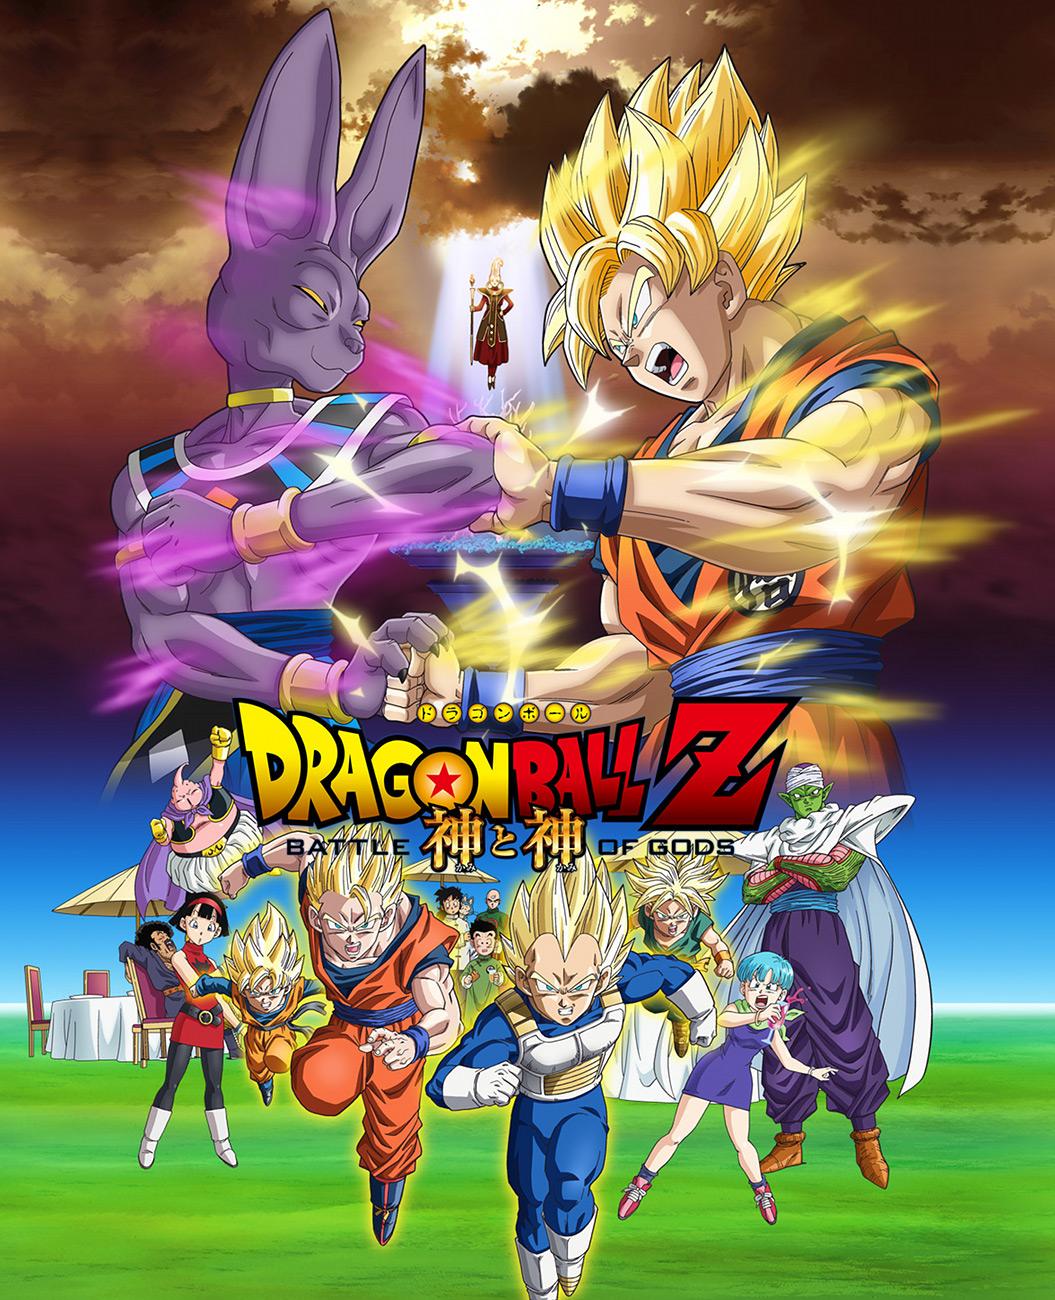 Songoku:Bảy viên ngọc rồng – Dragon ball Z: Battle Of God